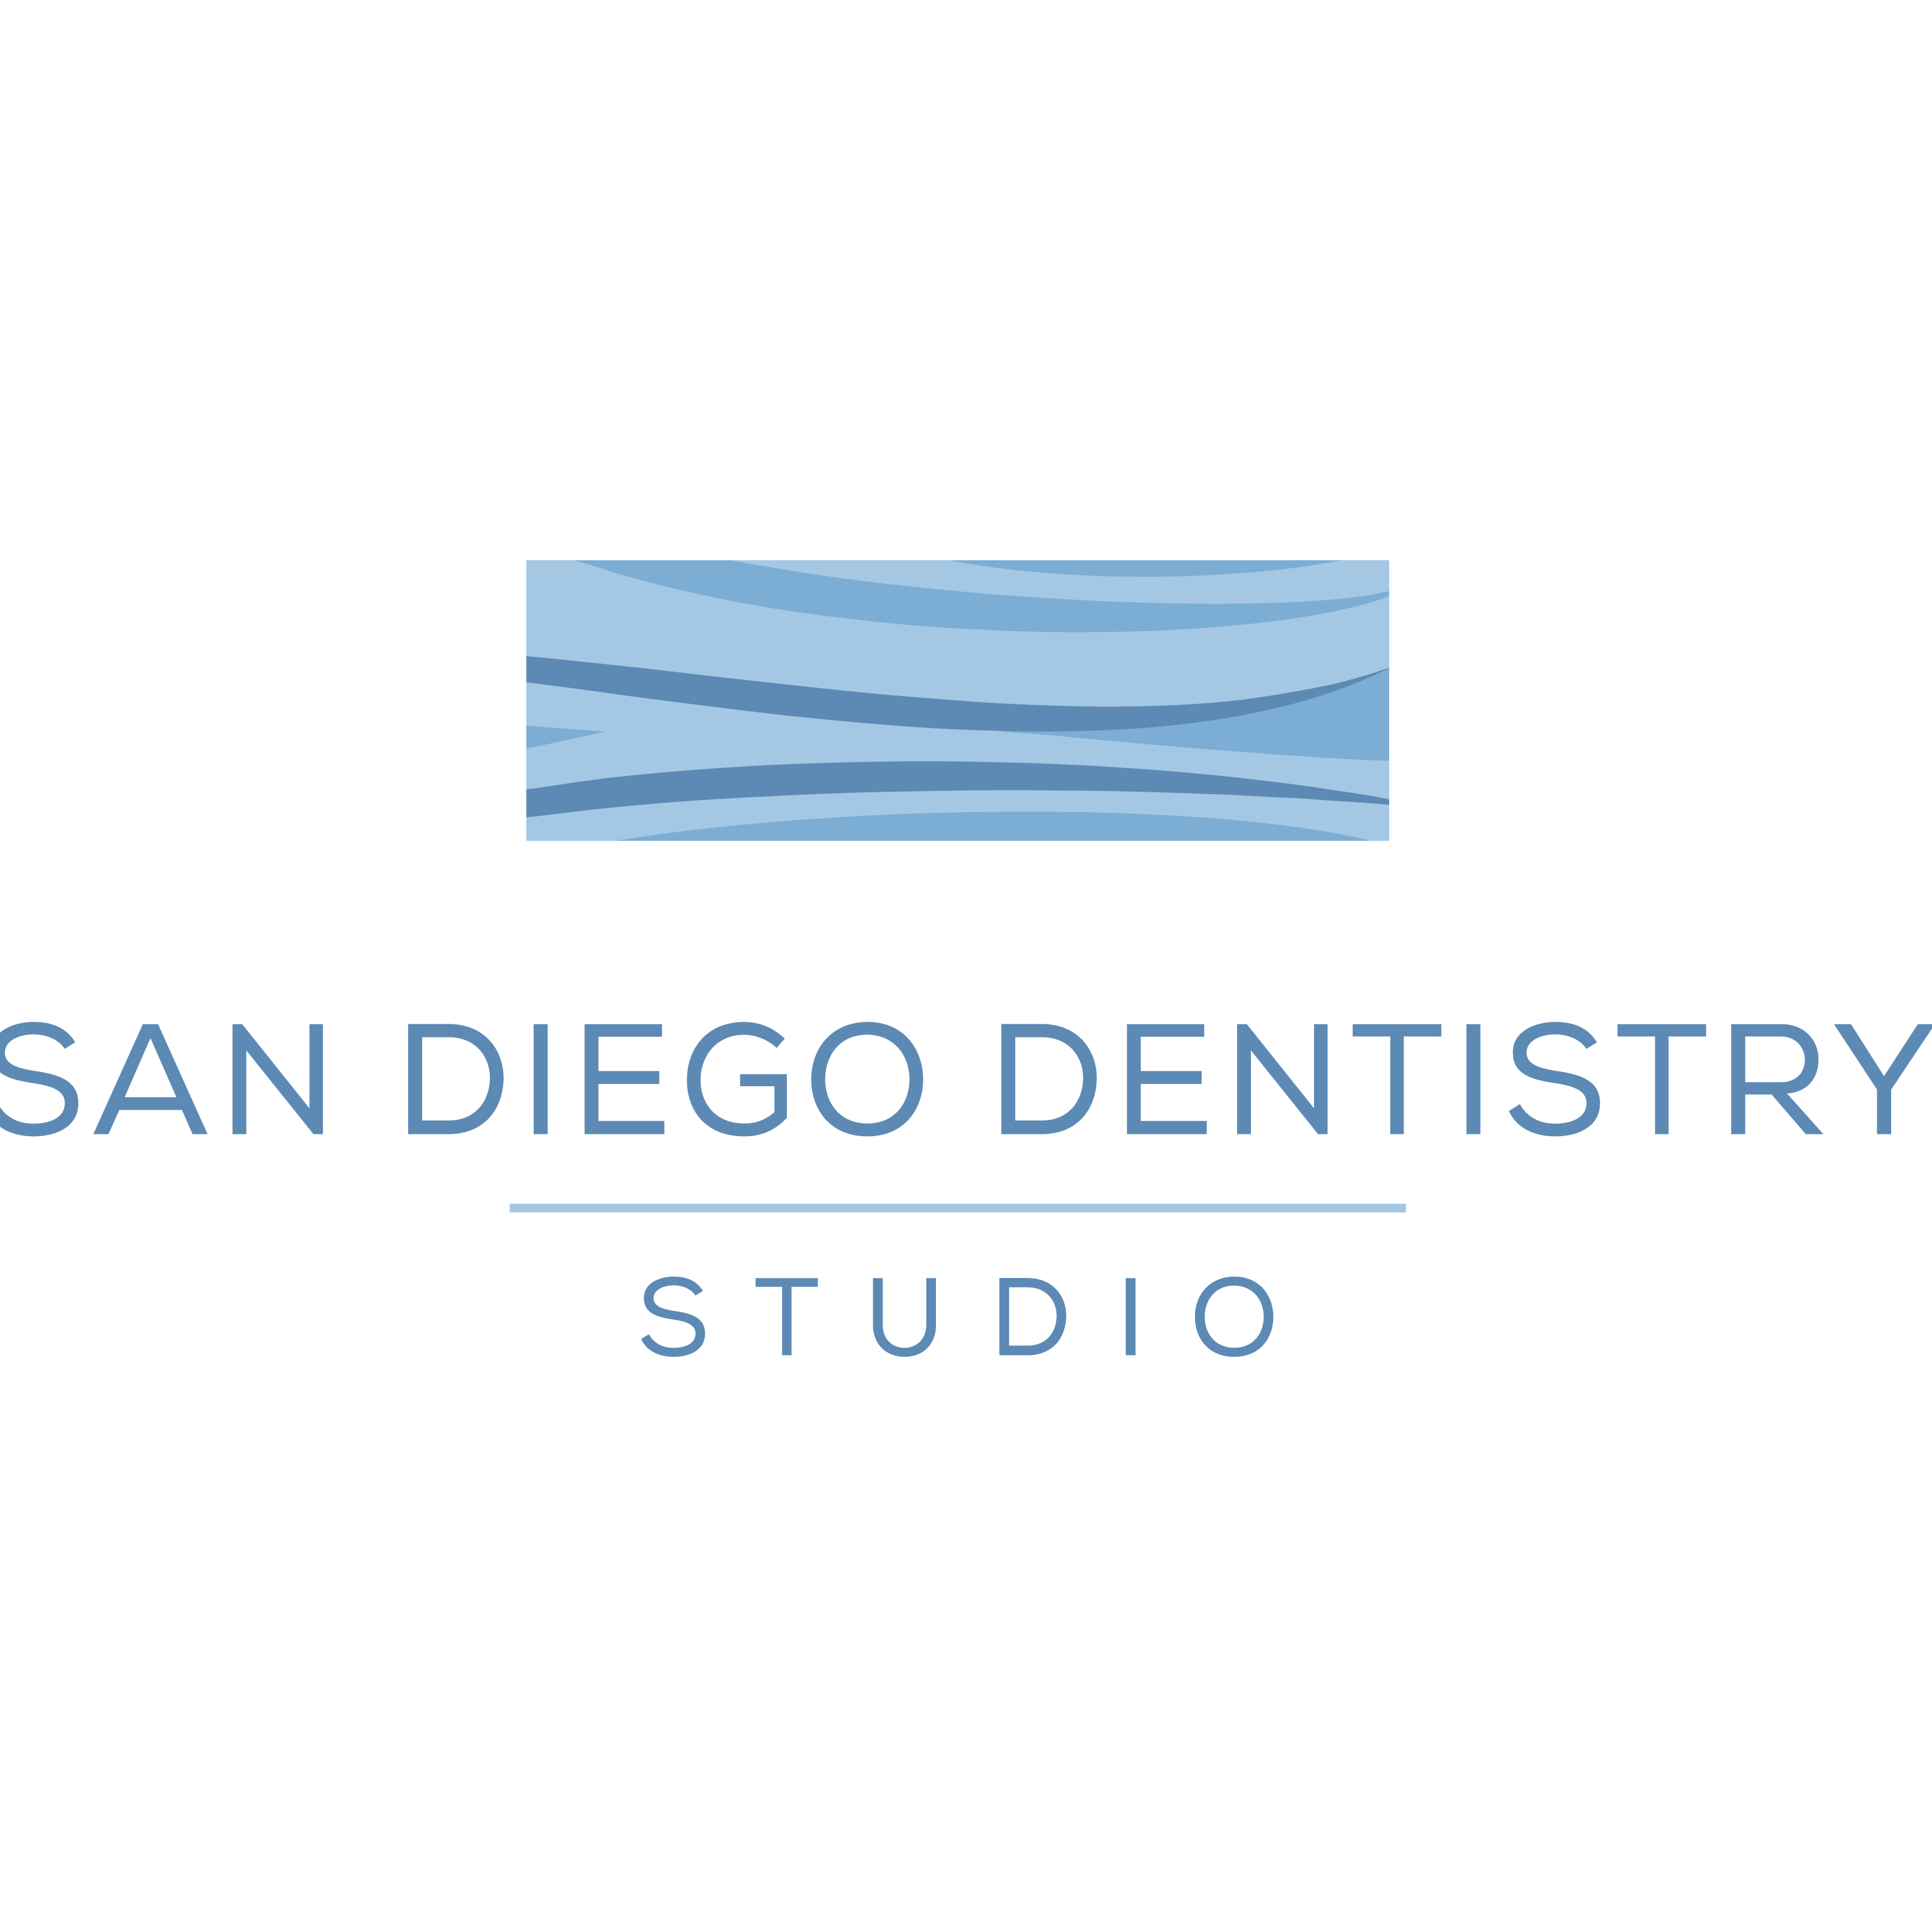 San Diego Dentistry Studio